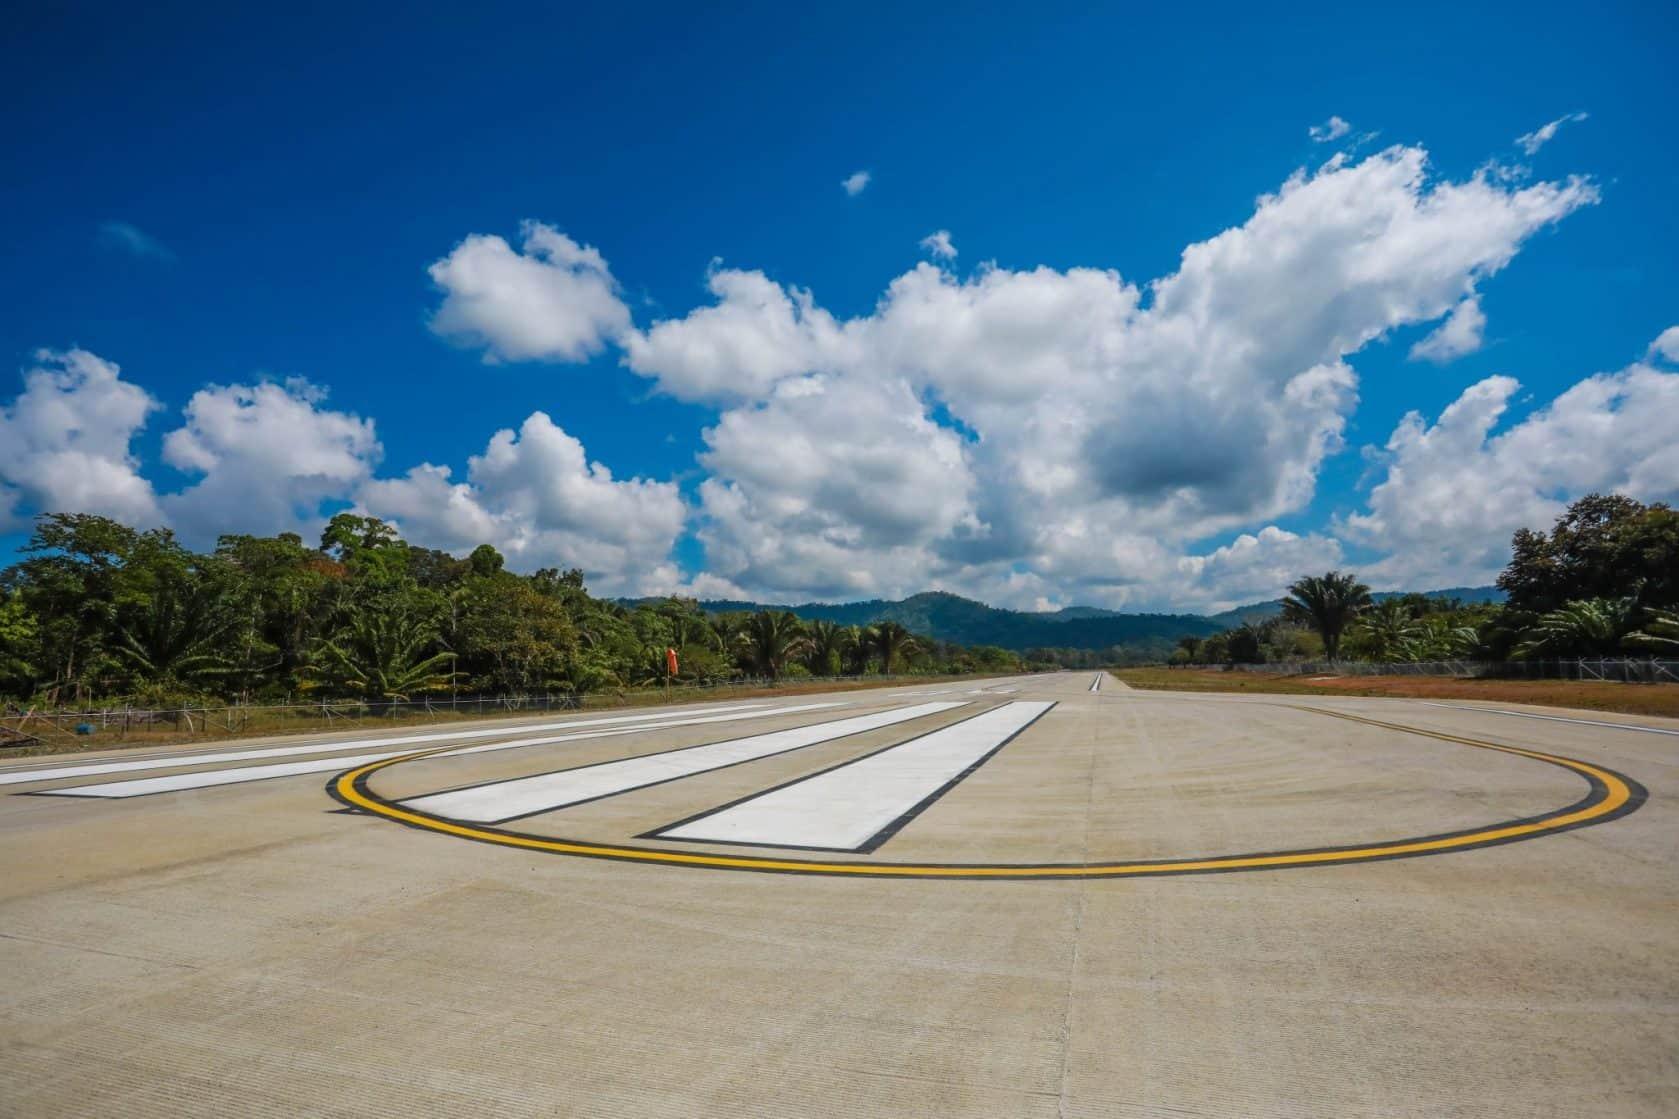 Drake Bay Airport